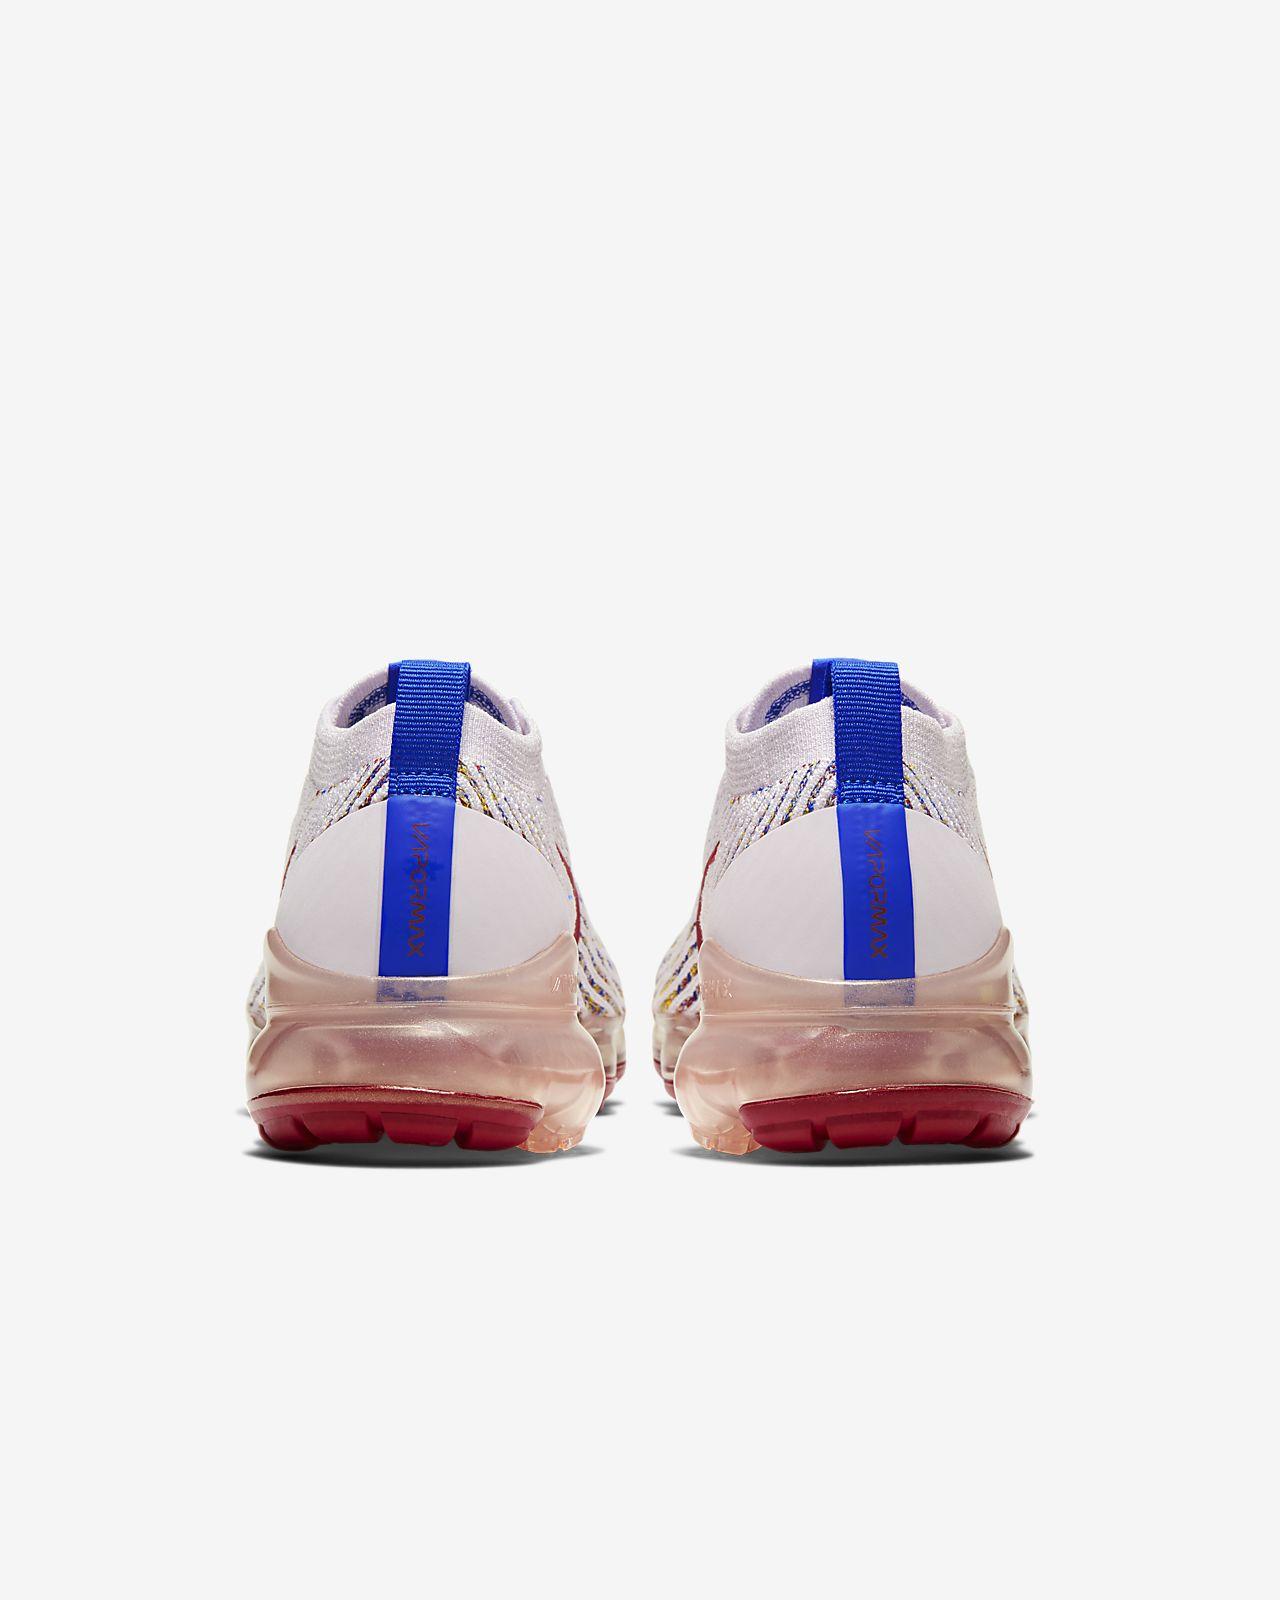 Nike Wmns Air Vapormax Flyknit 3 III Black White Women Running Shoes AJ6910-002